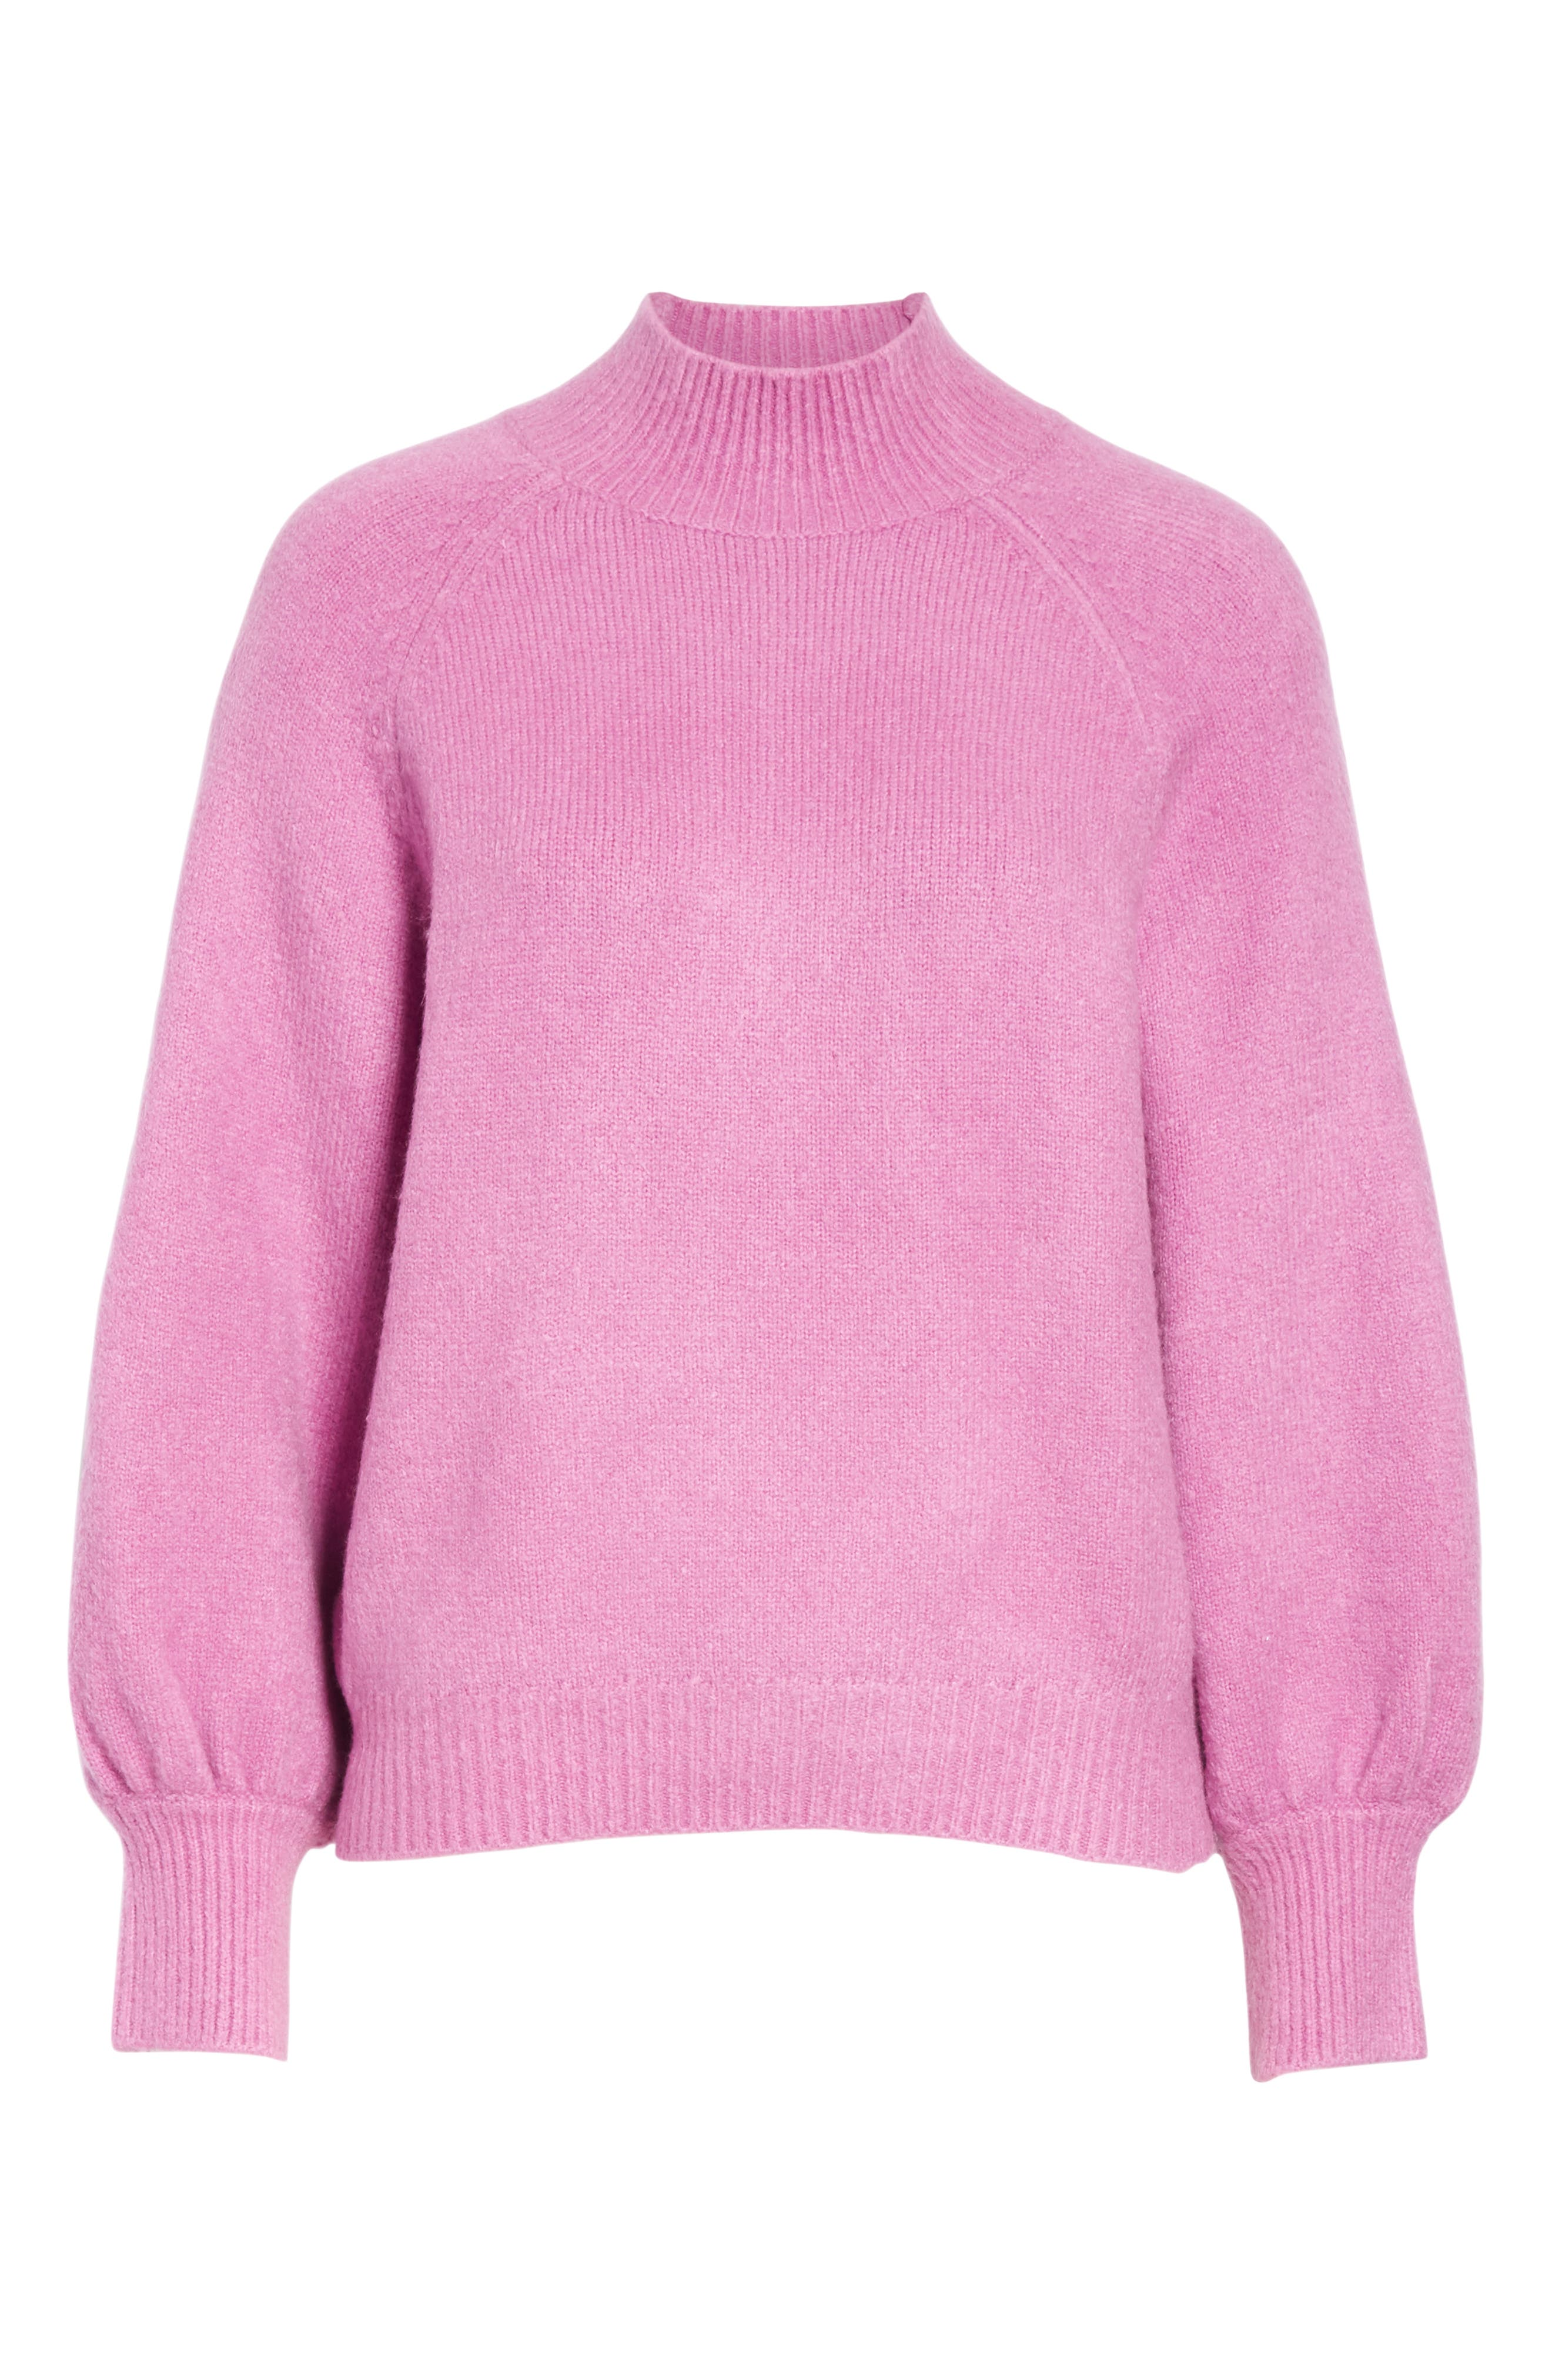 Jenlar Turtleneck Sweater,                             Alternate thumbnail 6, color,                             650